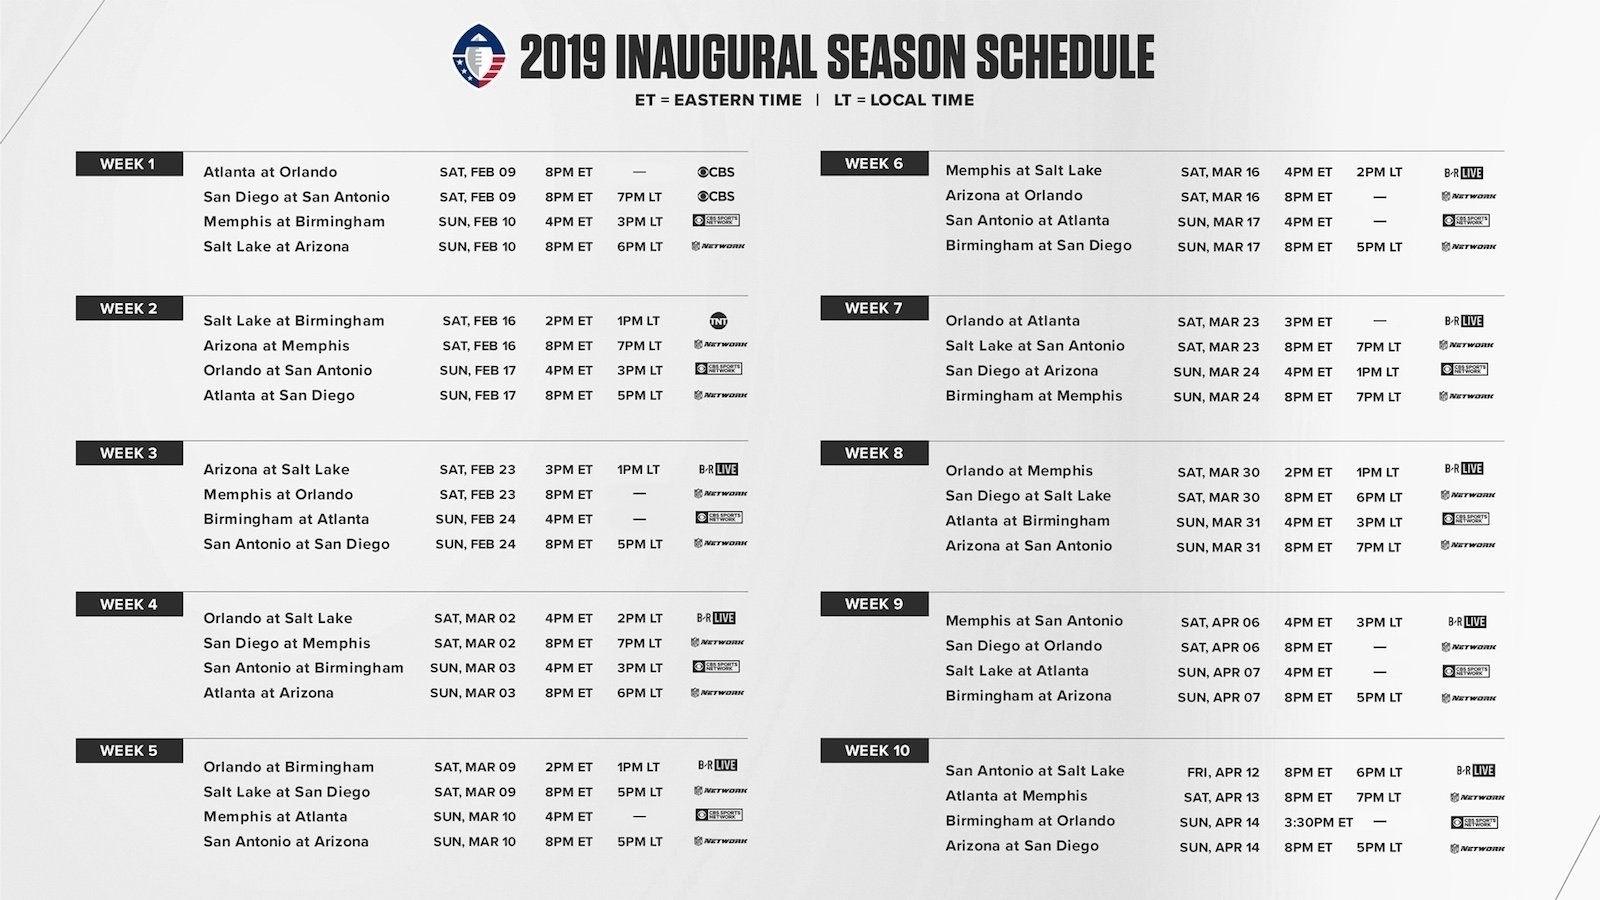 Printable Nfl Schedule For 2019 2020 In 2020   Printable Nfl within Nfl Schedule 2019 2020 Season Calendar